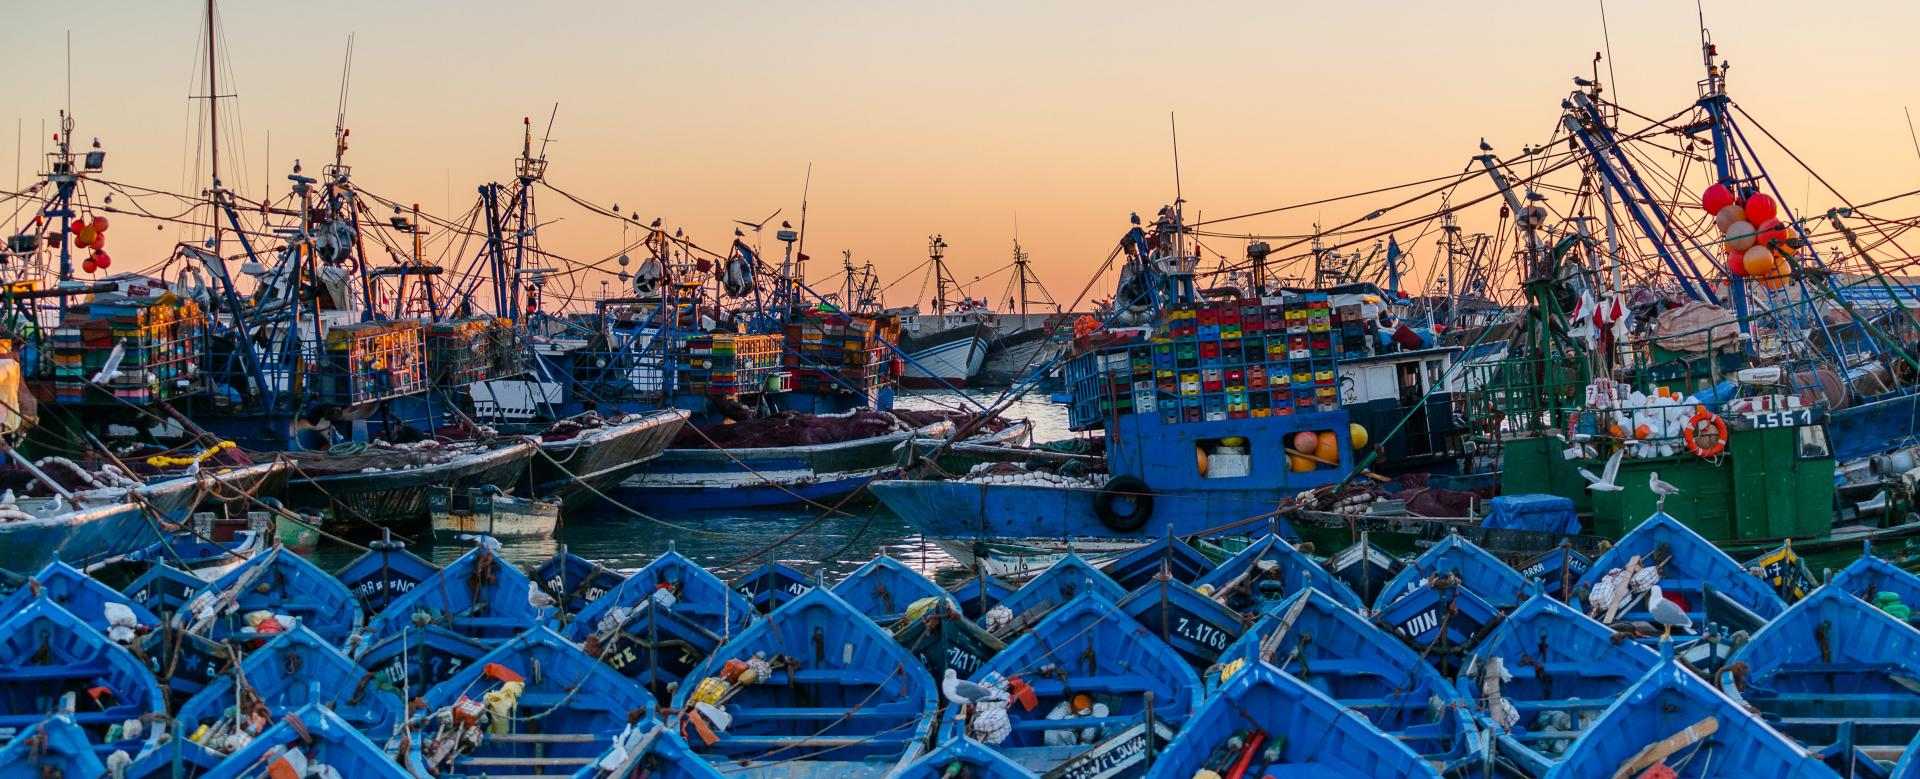 Voyage à pied Maroc : Rando bien-être à essaouira